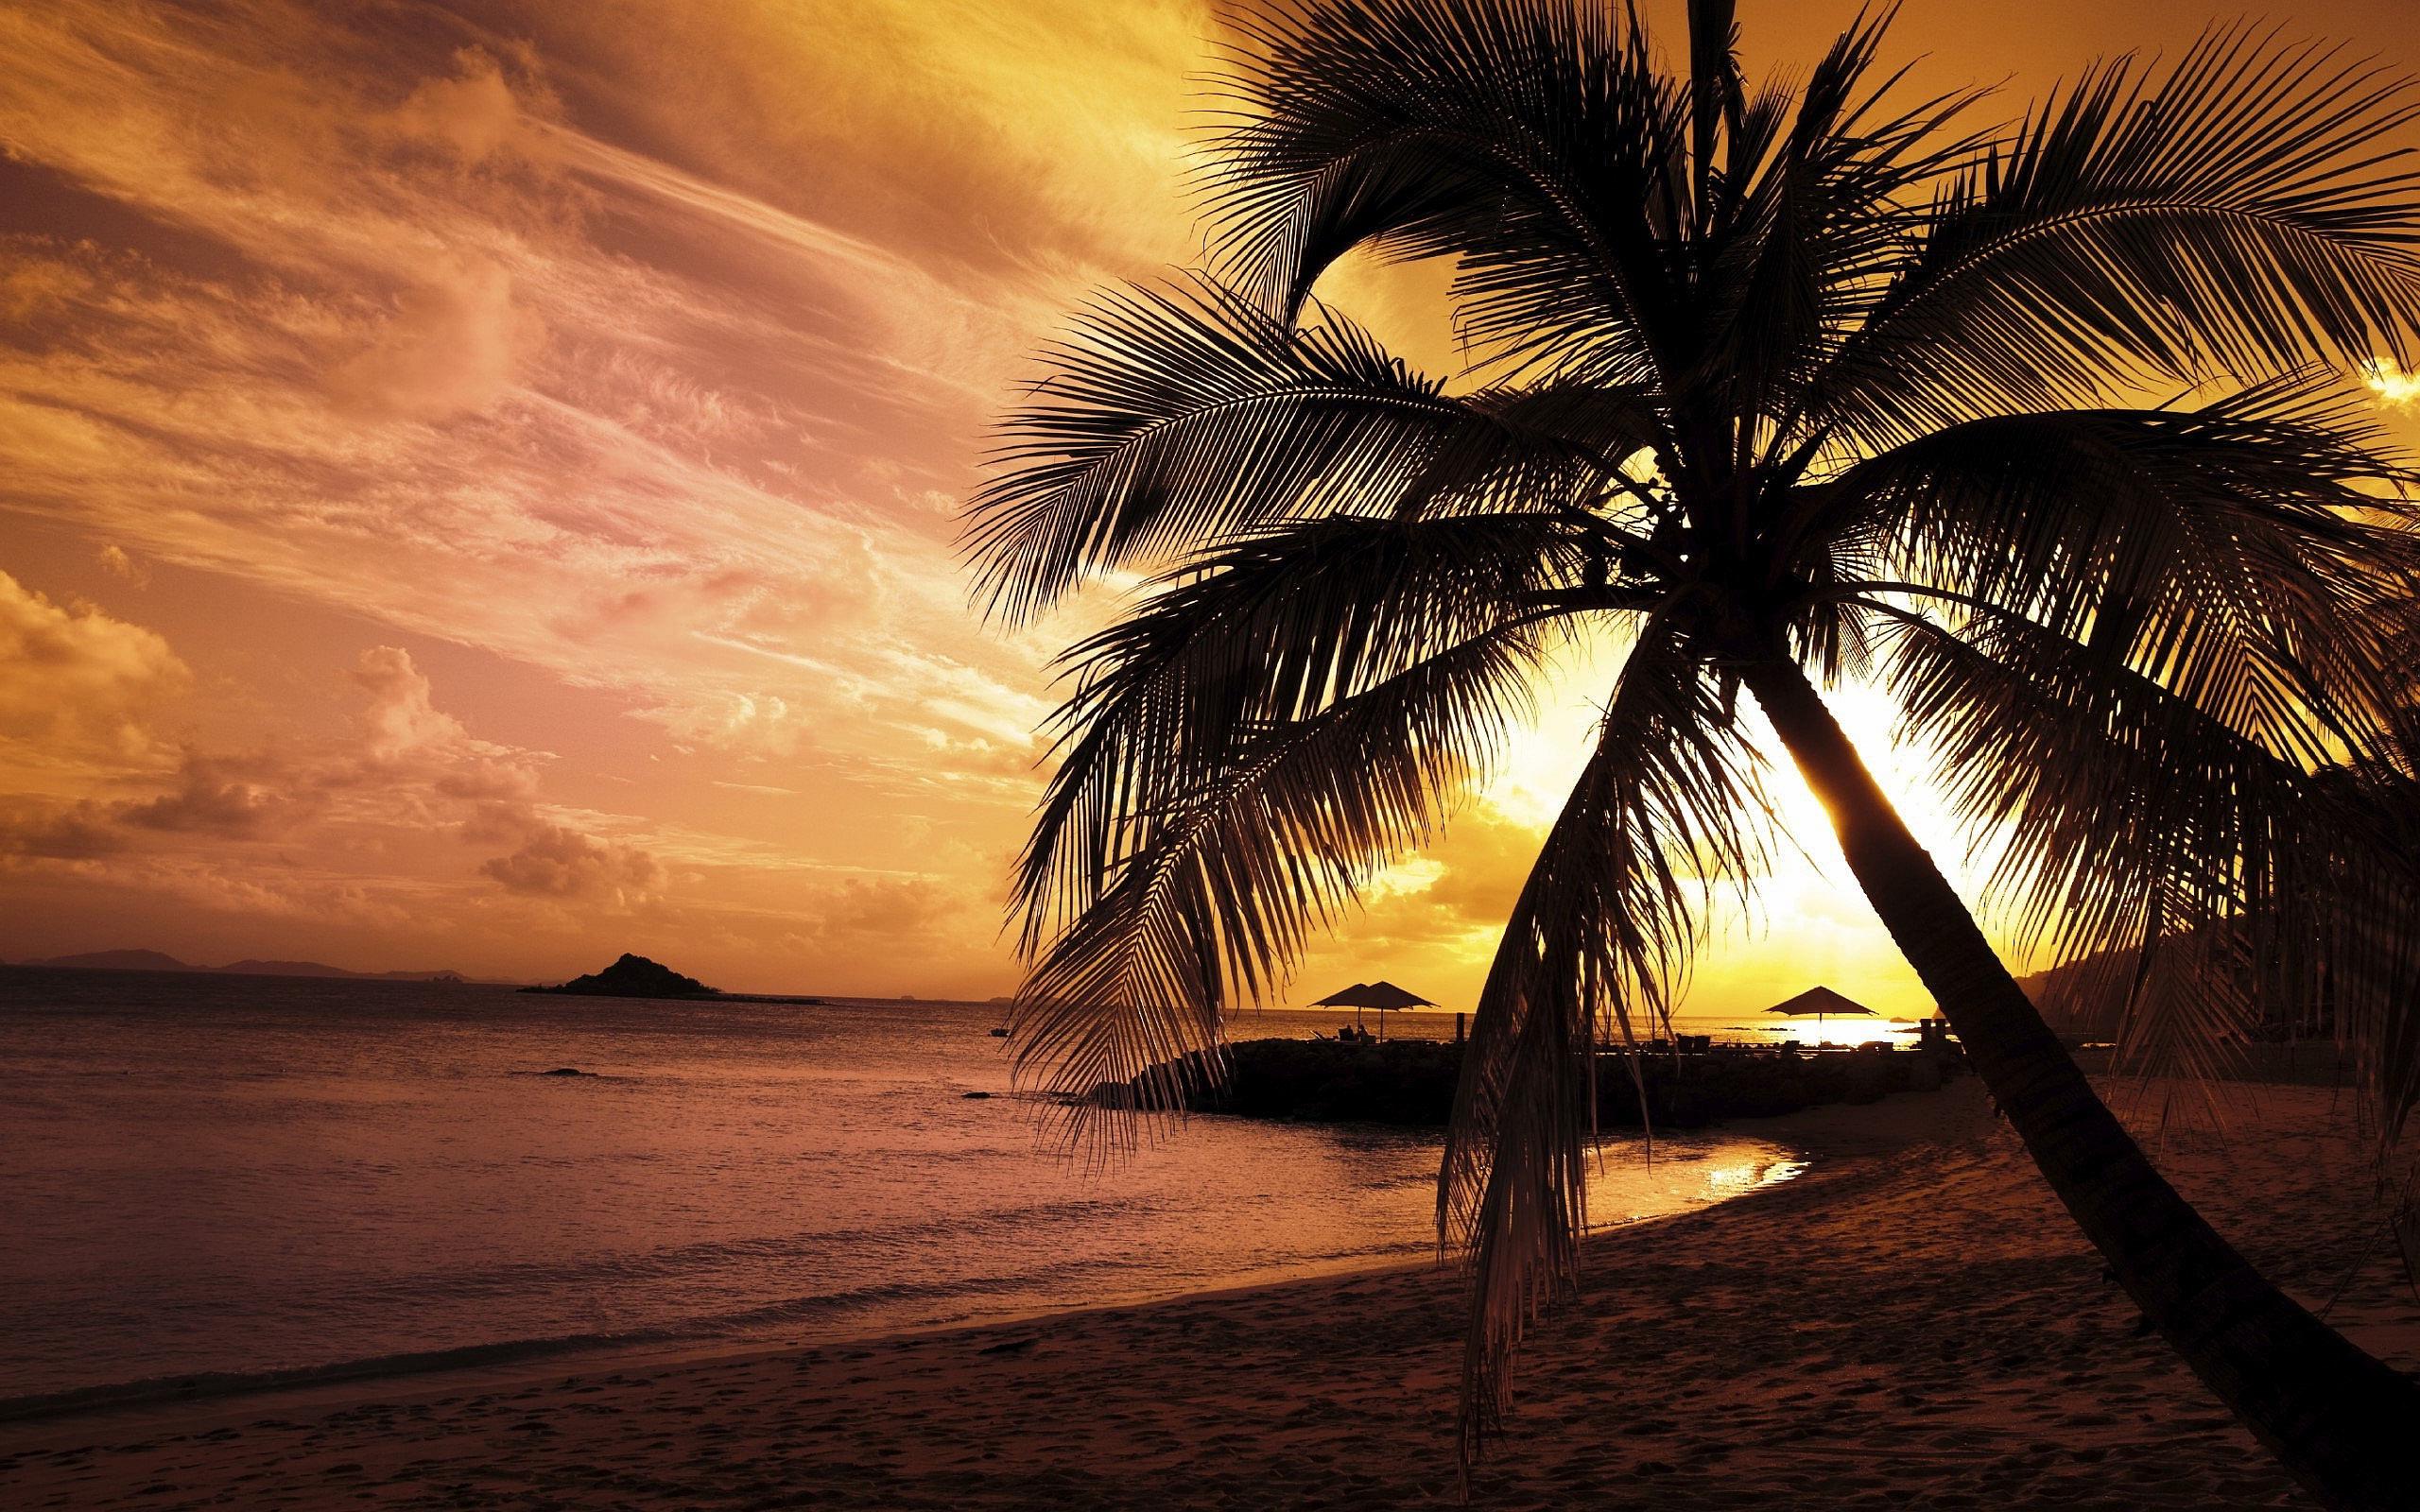 sunset images beach palm